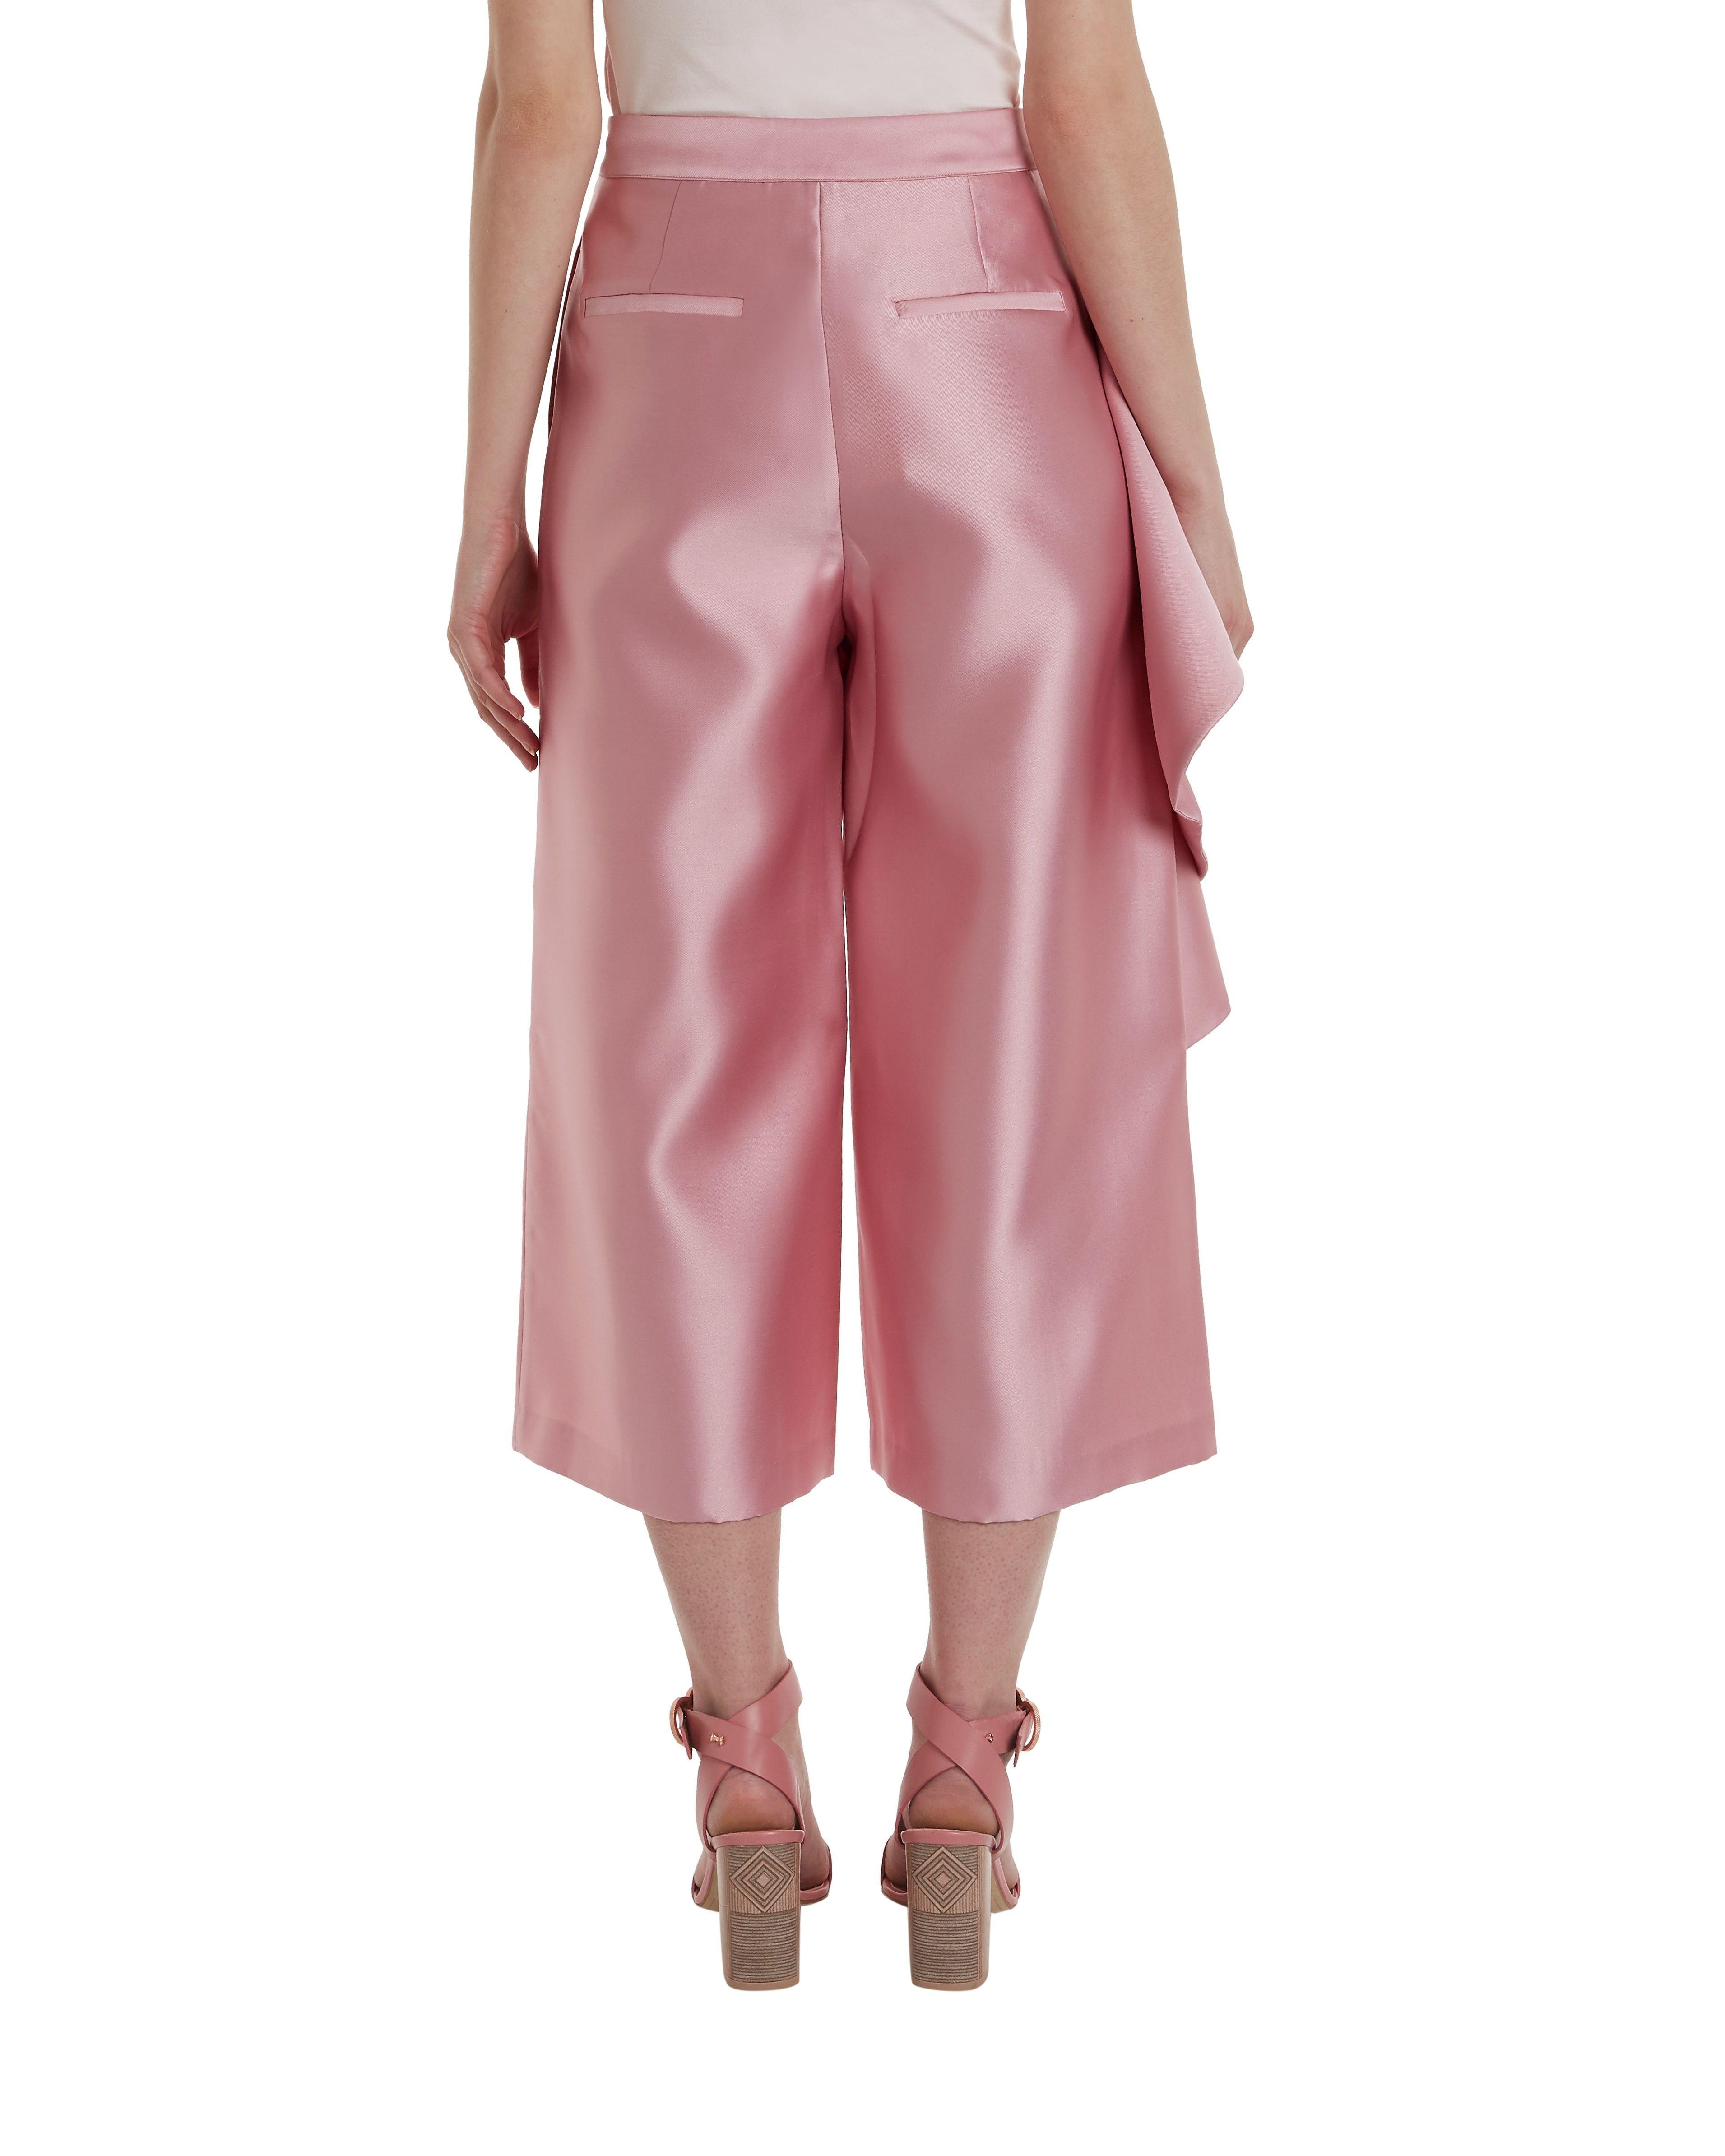 Ted Baker Nannina Wide Leg Ruffle Trousers in Dusky Pink